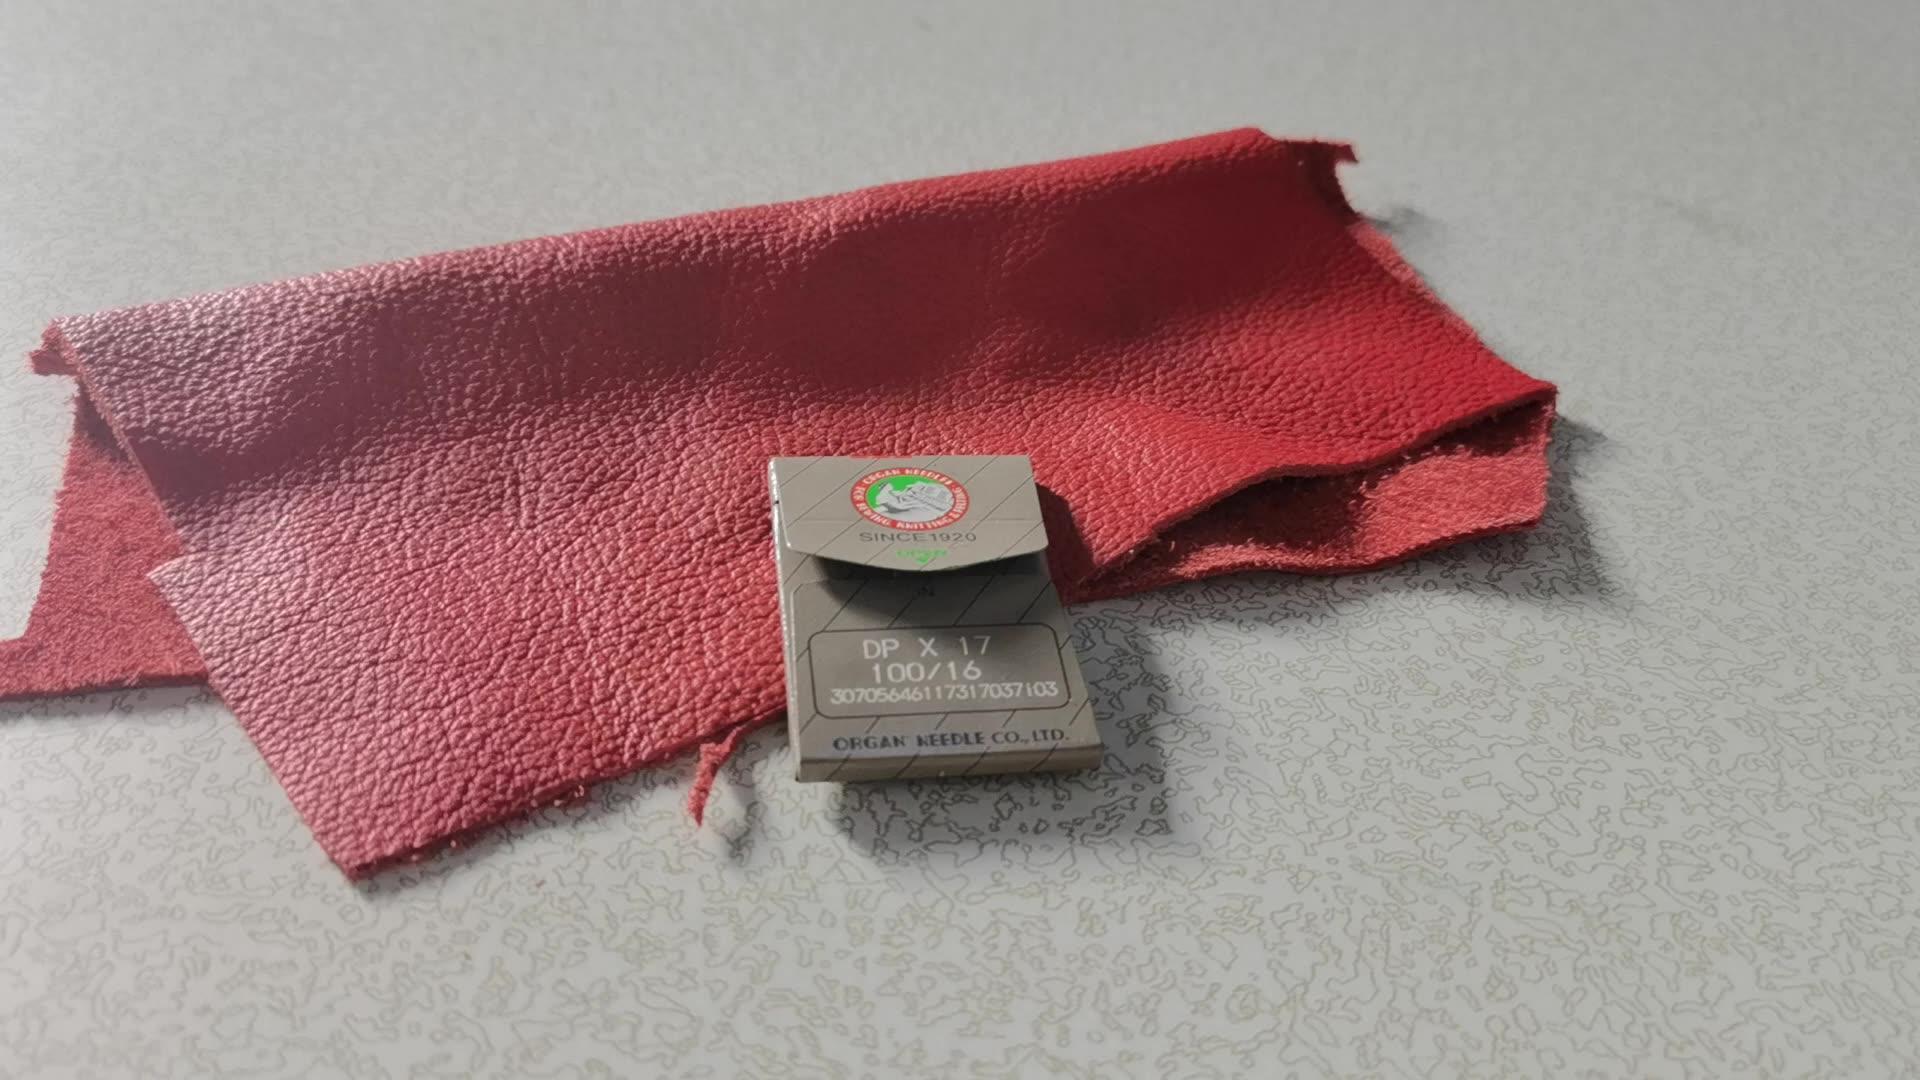 Japan Organ Needles sewing machine needle DP X 17 for sewing machine 135 X 17 140/22 120/ 19 110/18  125/20  130/21  160/23